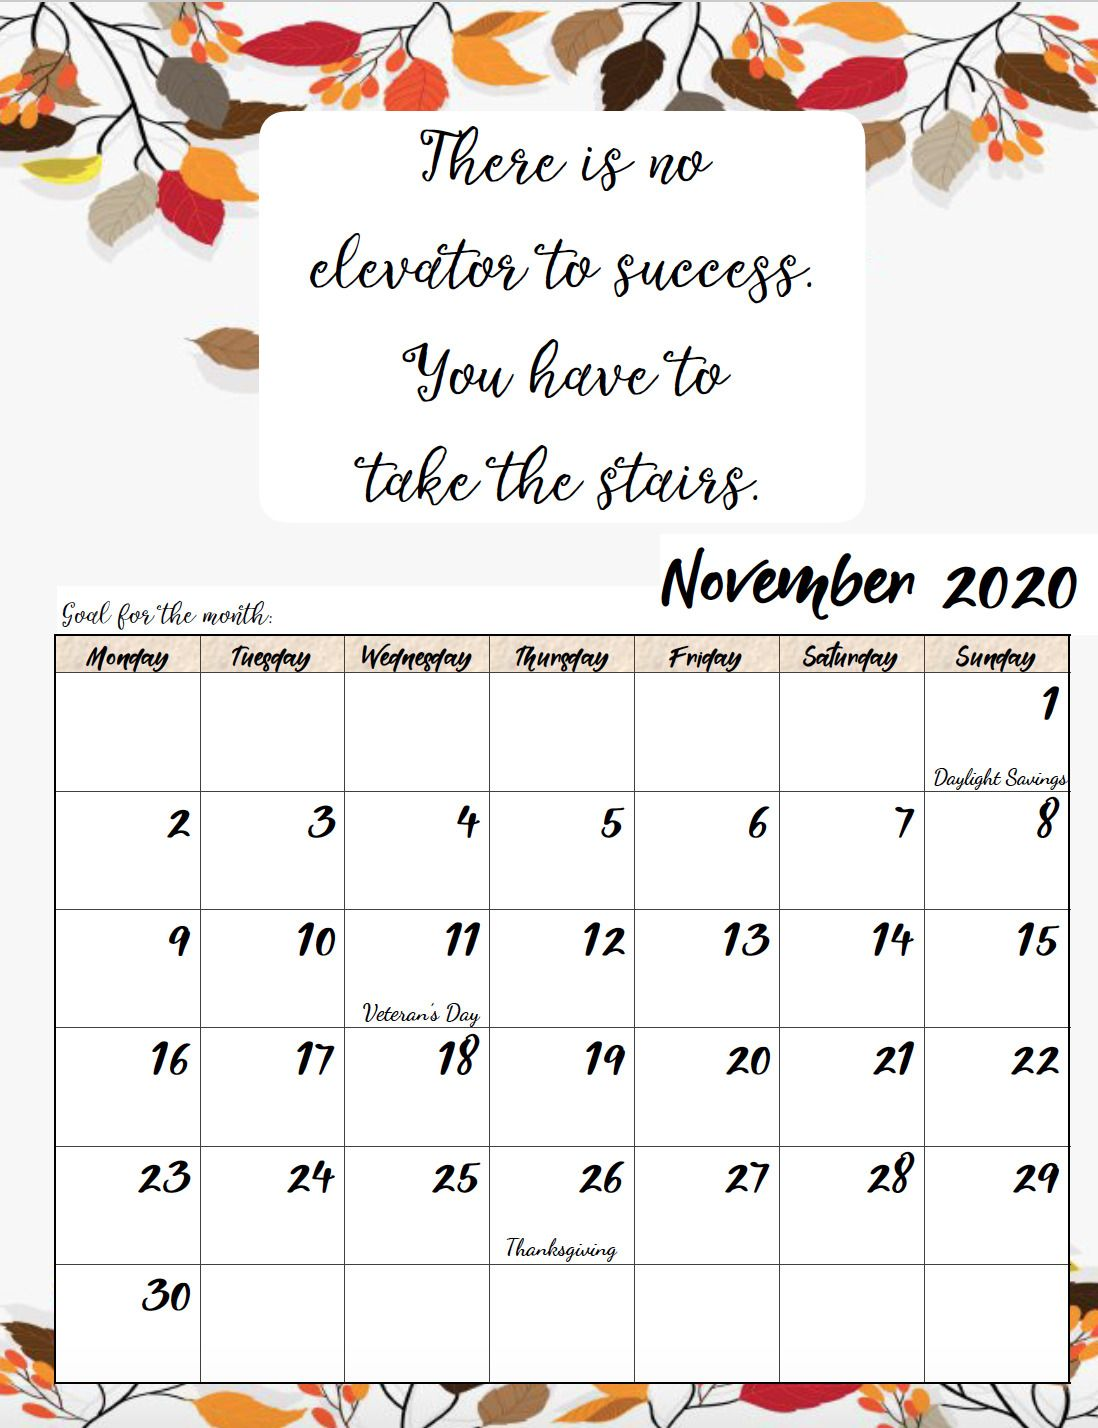 Free Printable 2020 Monday Start Monthly Motivational Calendars